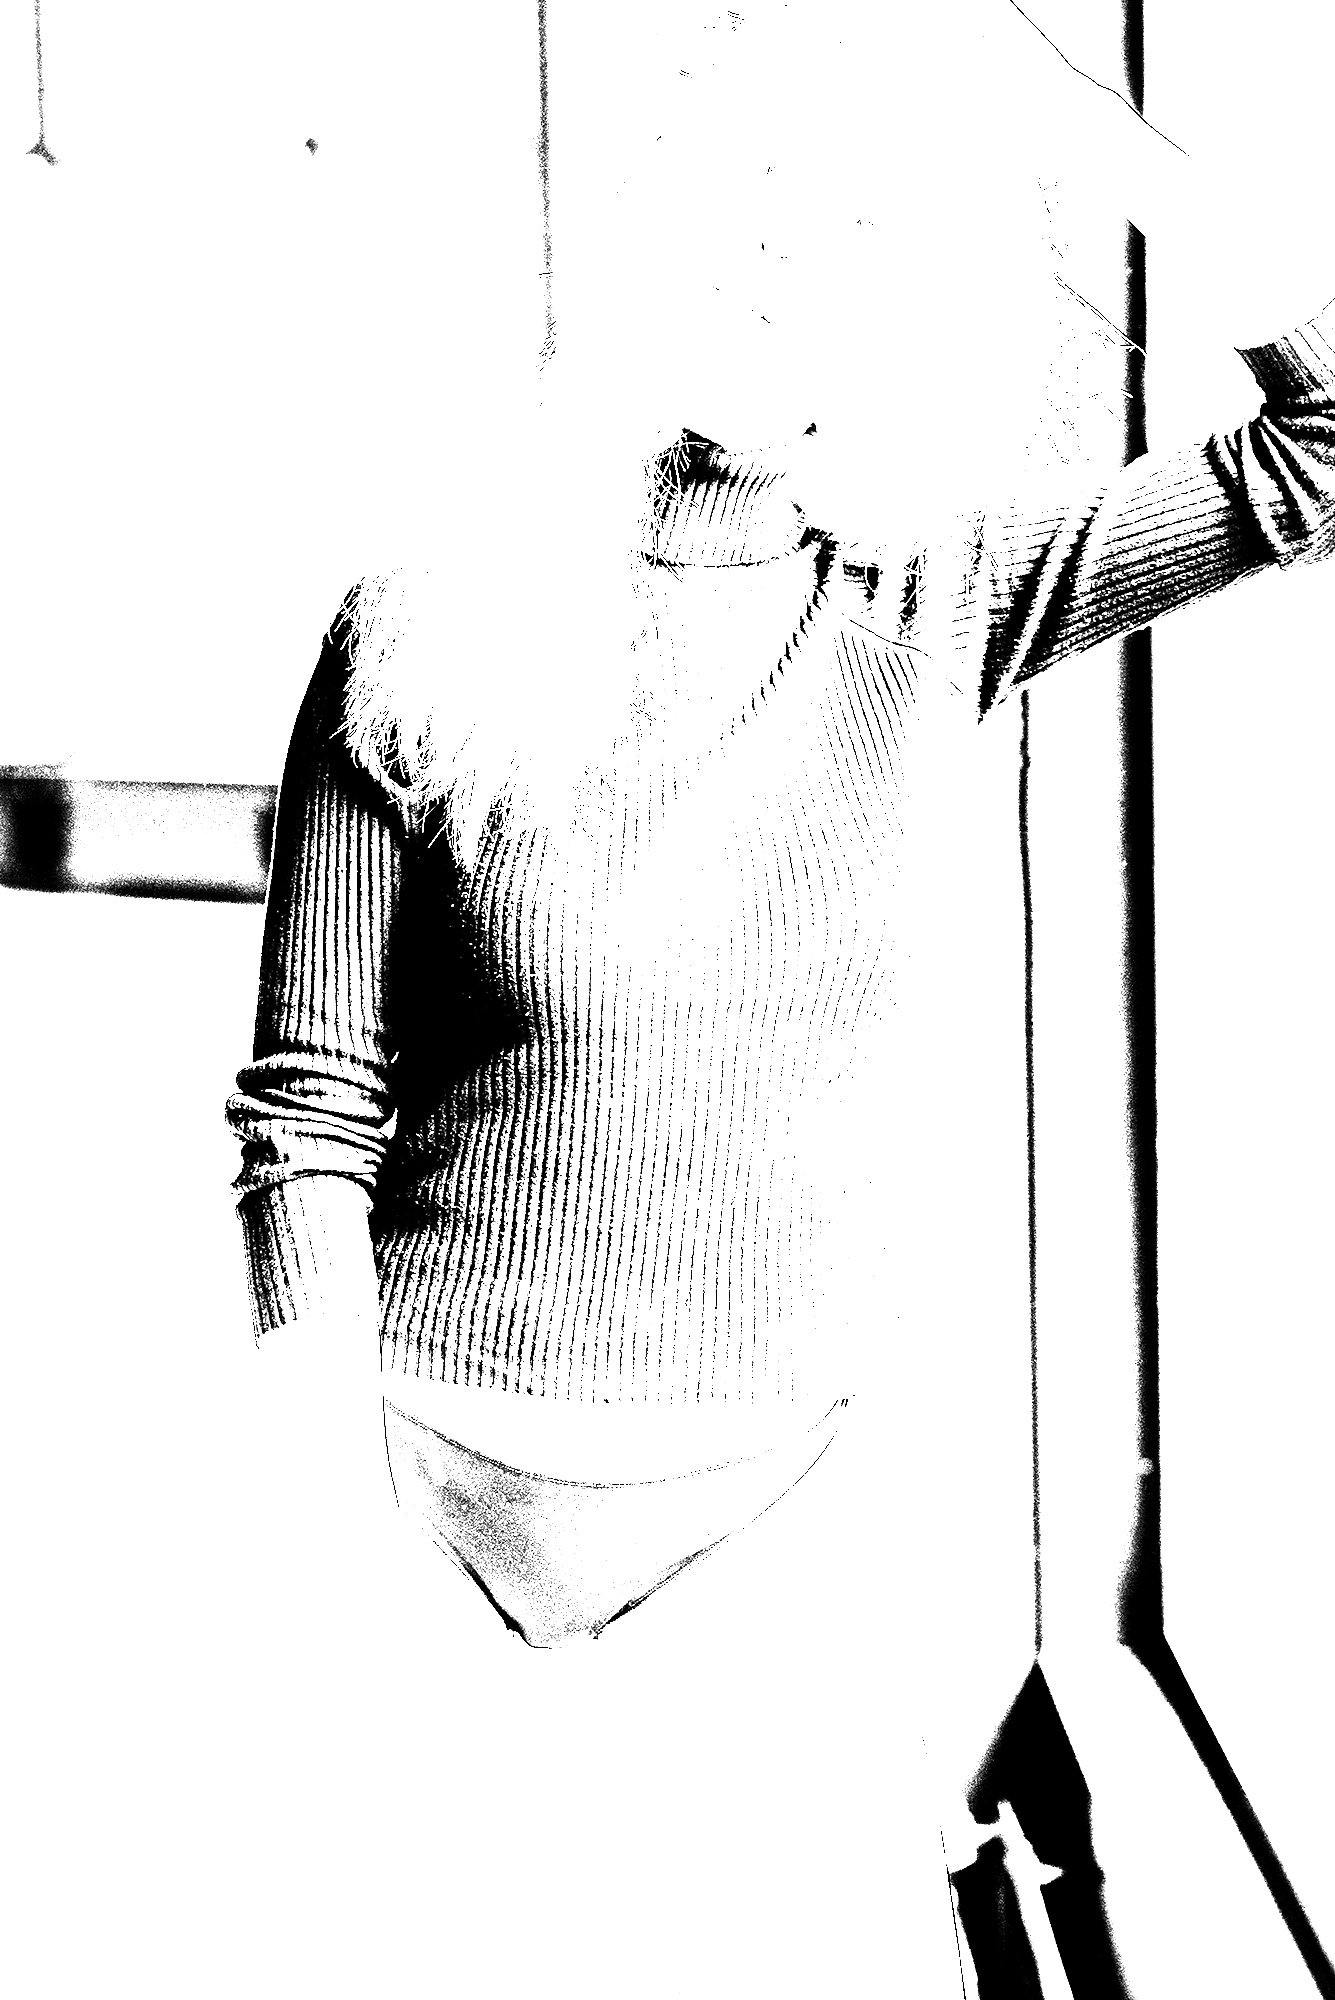 20161218-DSC_9551.png